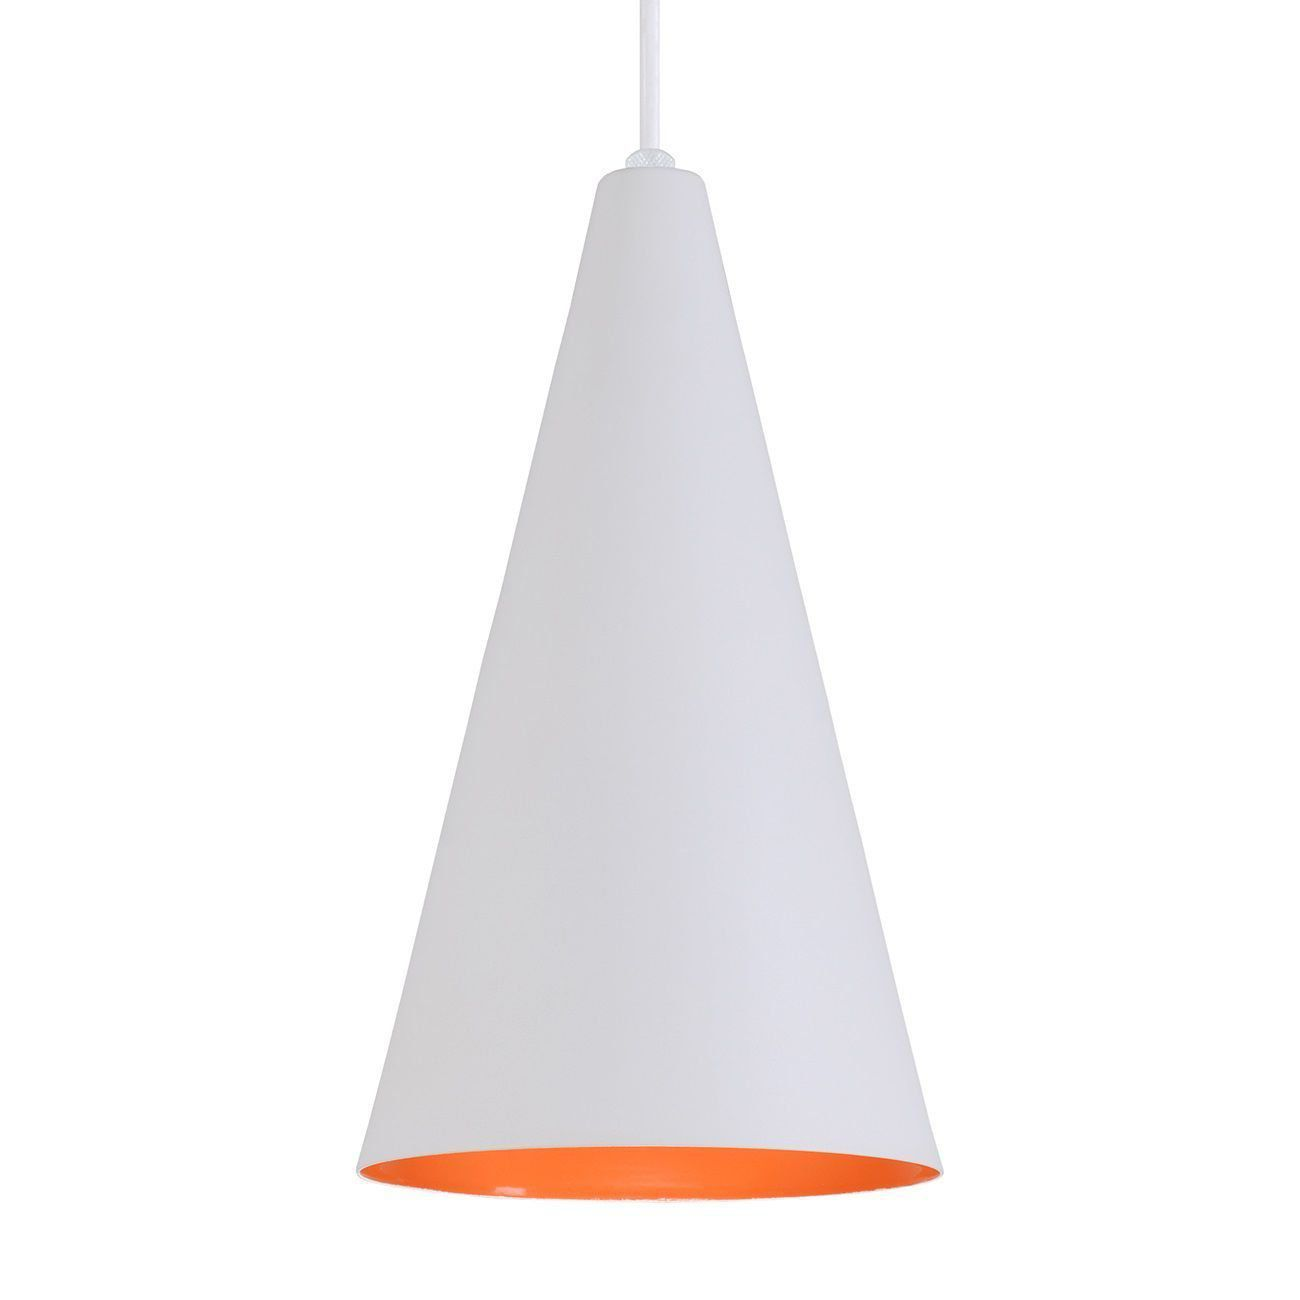 Pendente Cone Luminária Lustre Alumínio Branco Textura C/ Laranja - Rei Da Iluminação